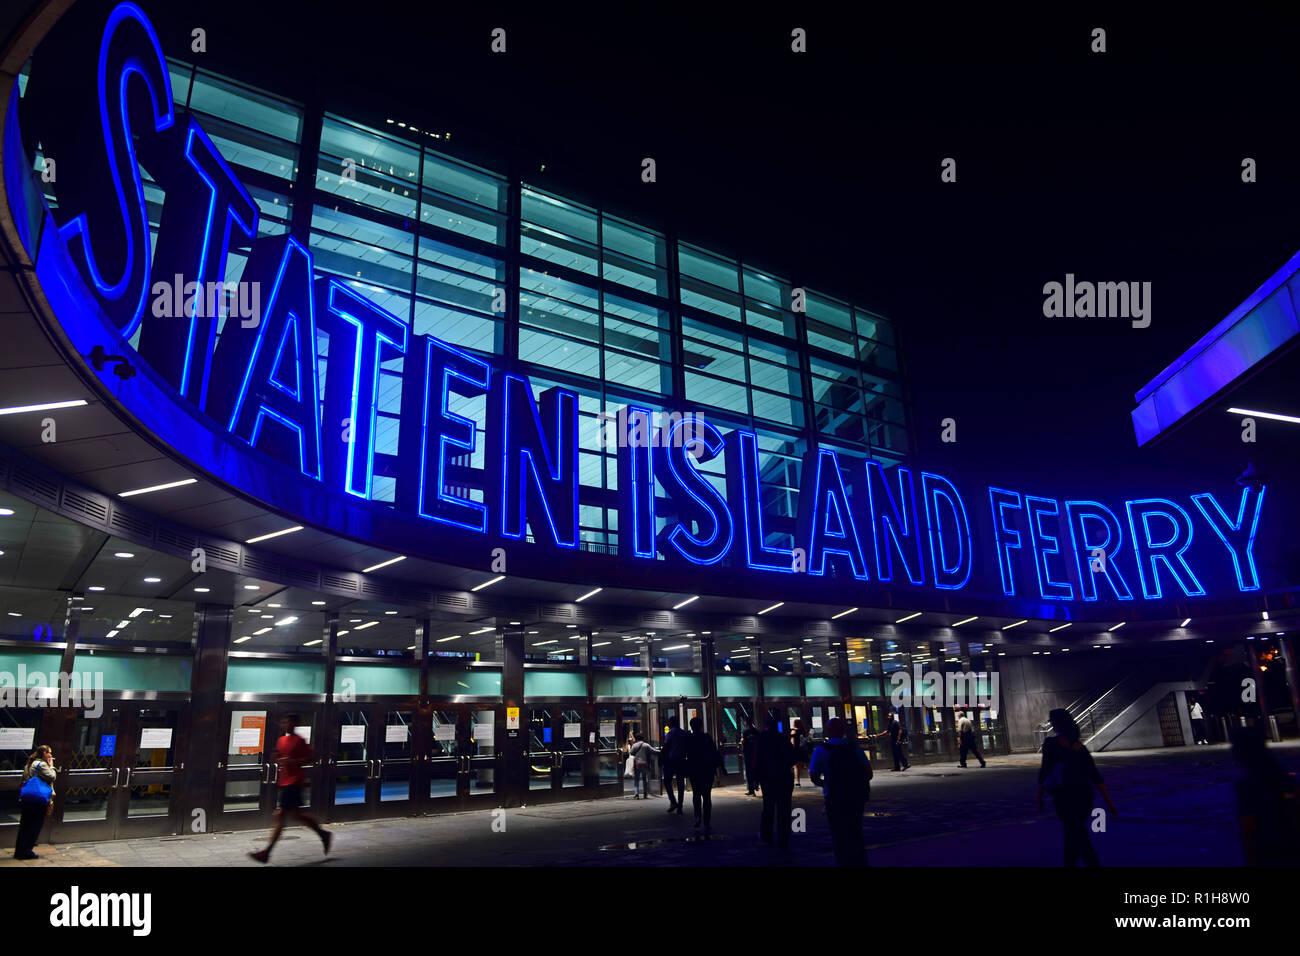 Staten Island Ferry Terminal, Manhattan, New York City, USA - Stock Image